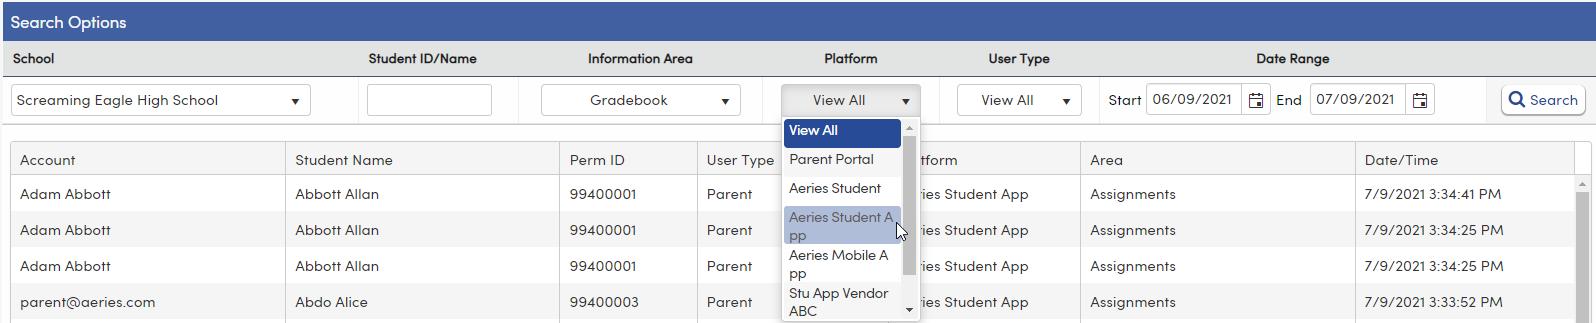 Portal Usage Log - Platform filter